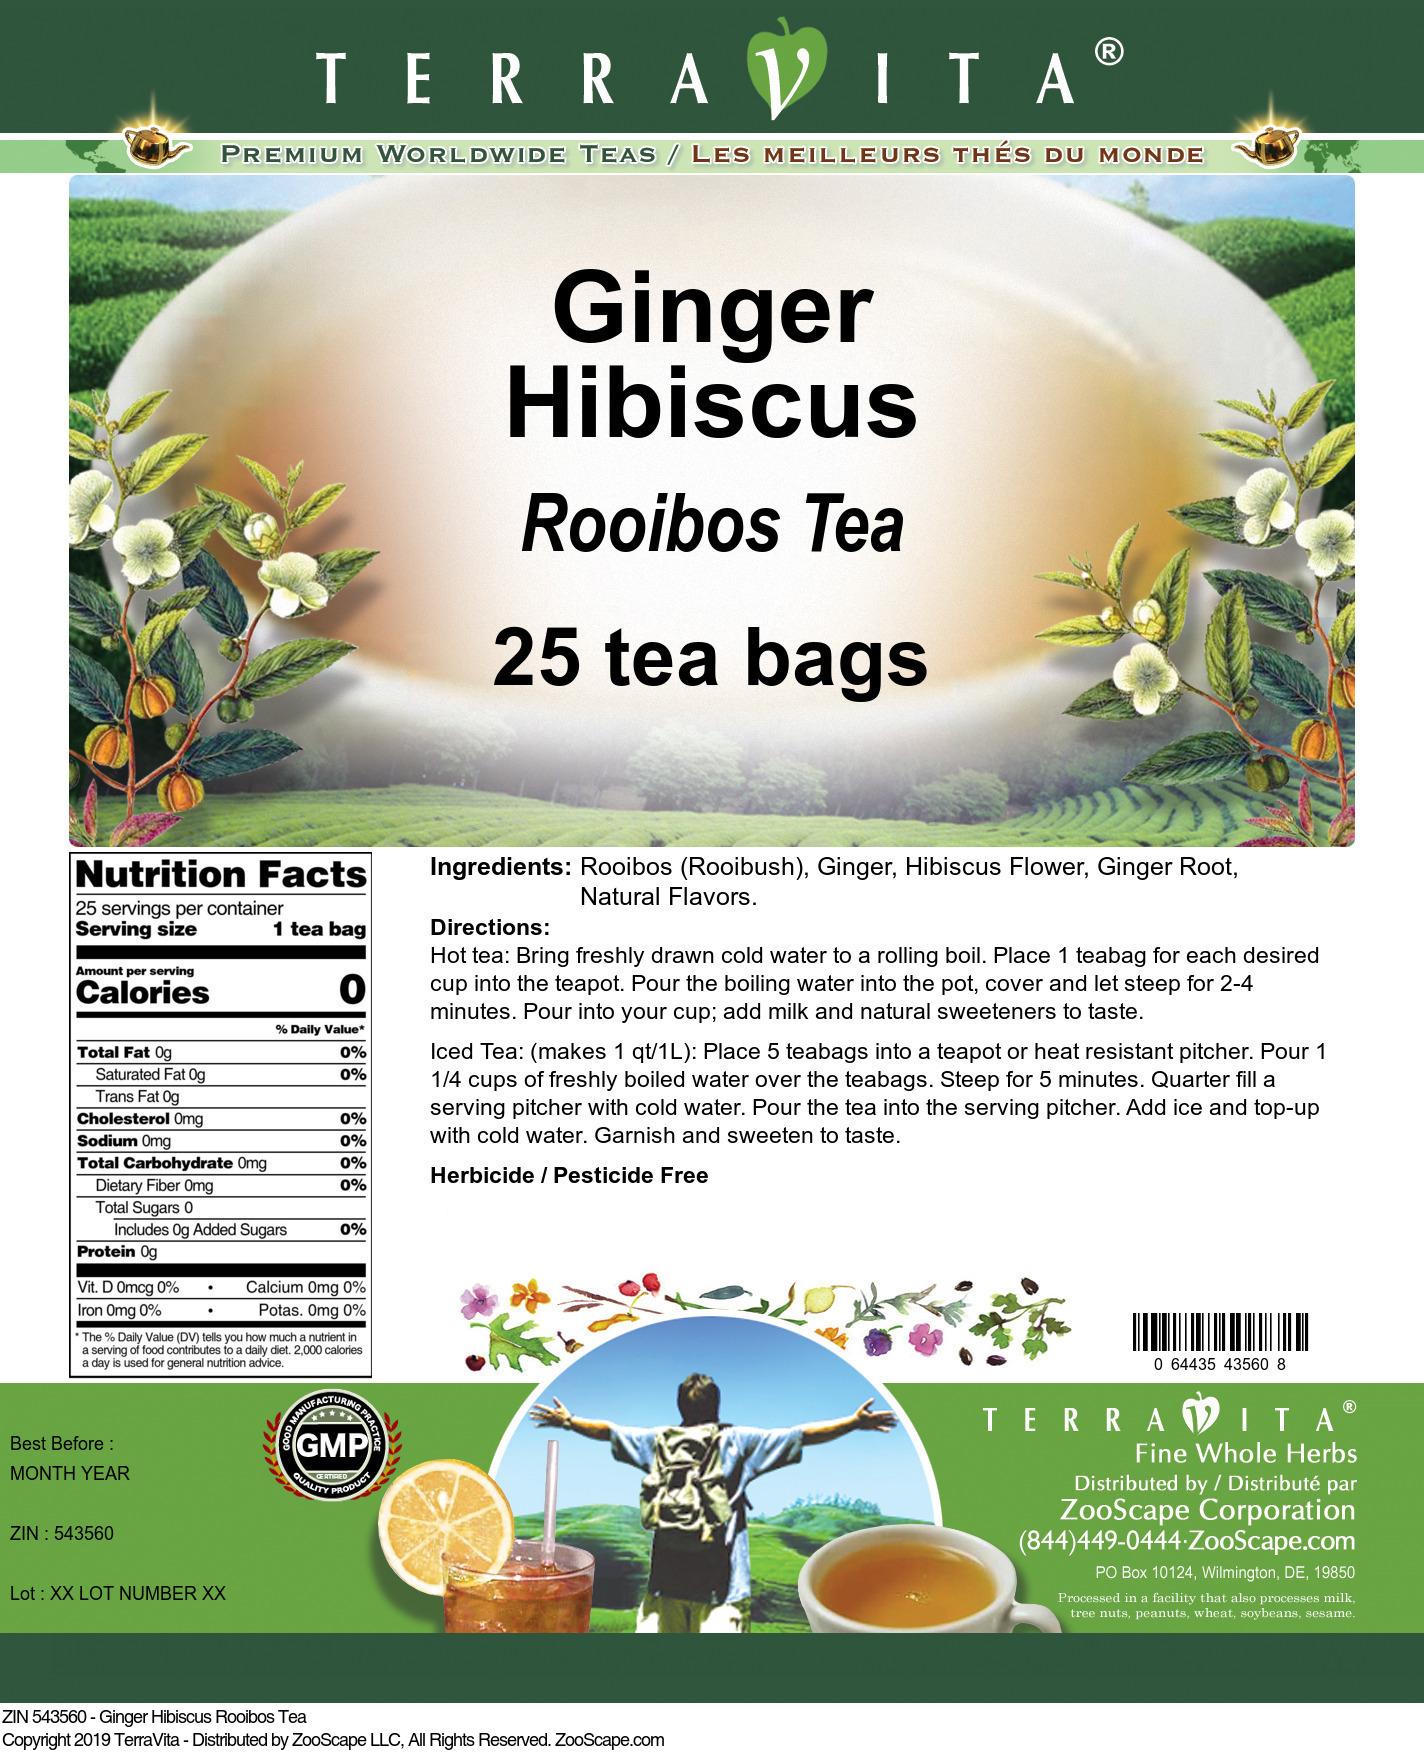 Ginger Hibiscus Rooibos Tea